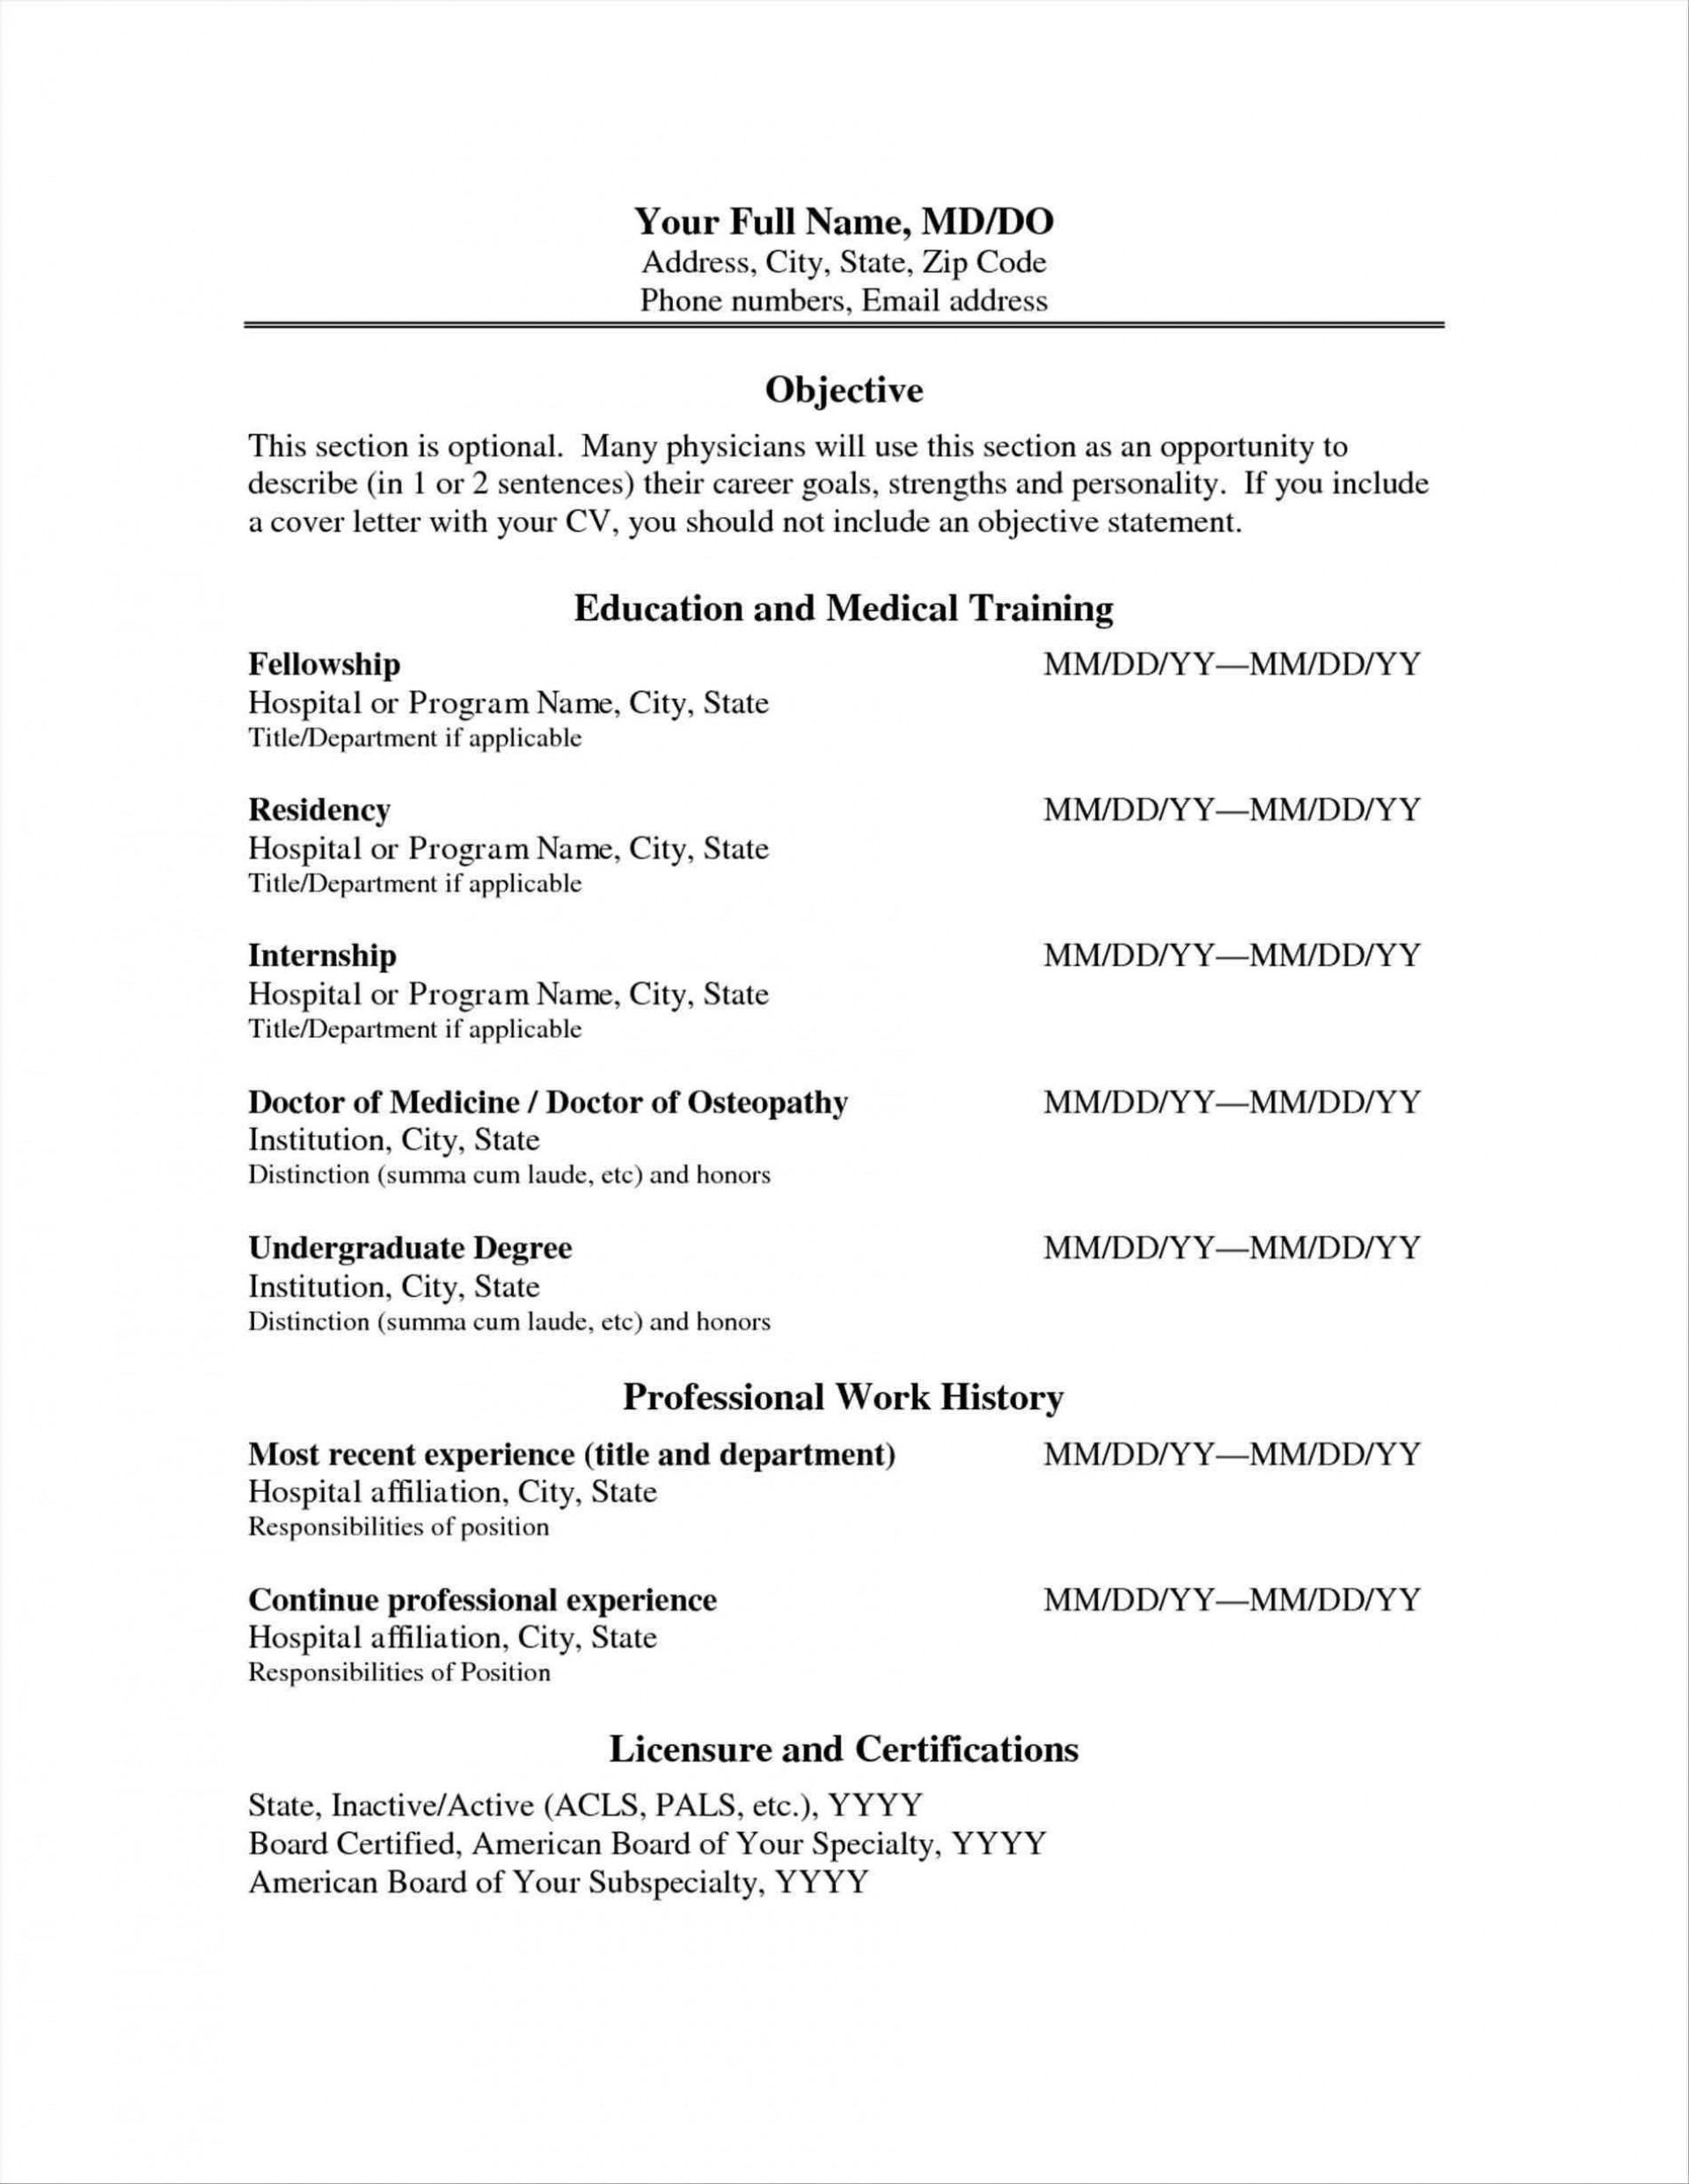 009 Impressive Medical Curriculum Vitae Template Sample  Templates Word Student1920